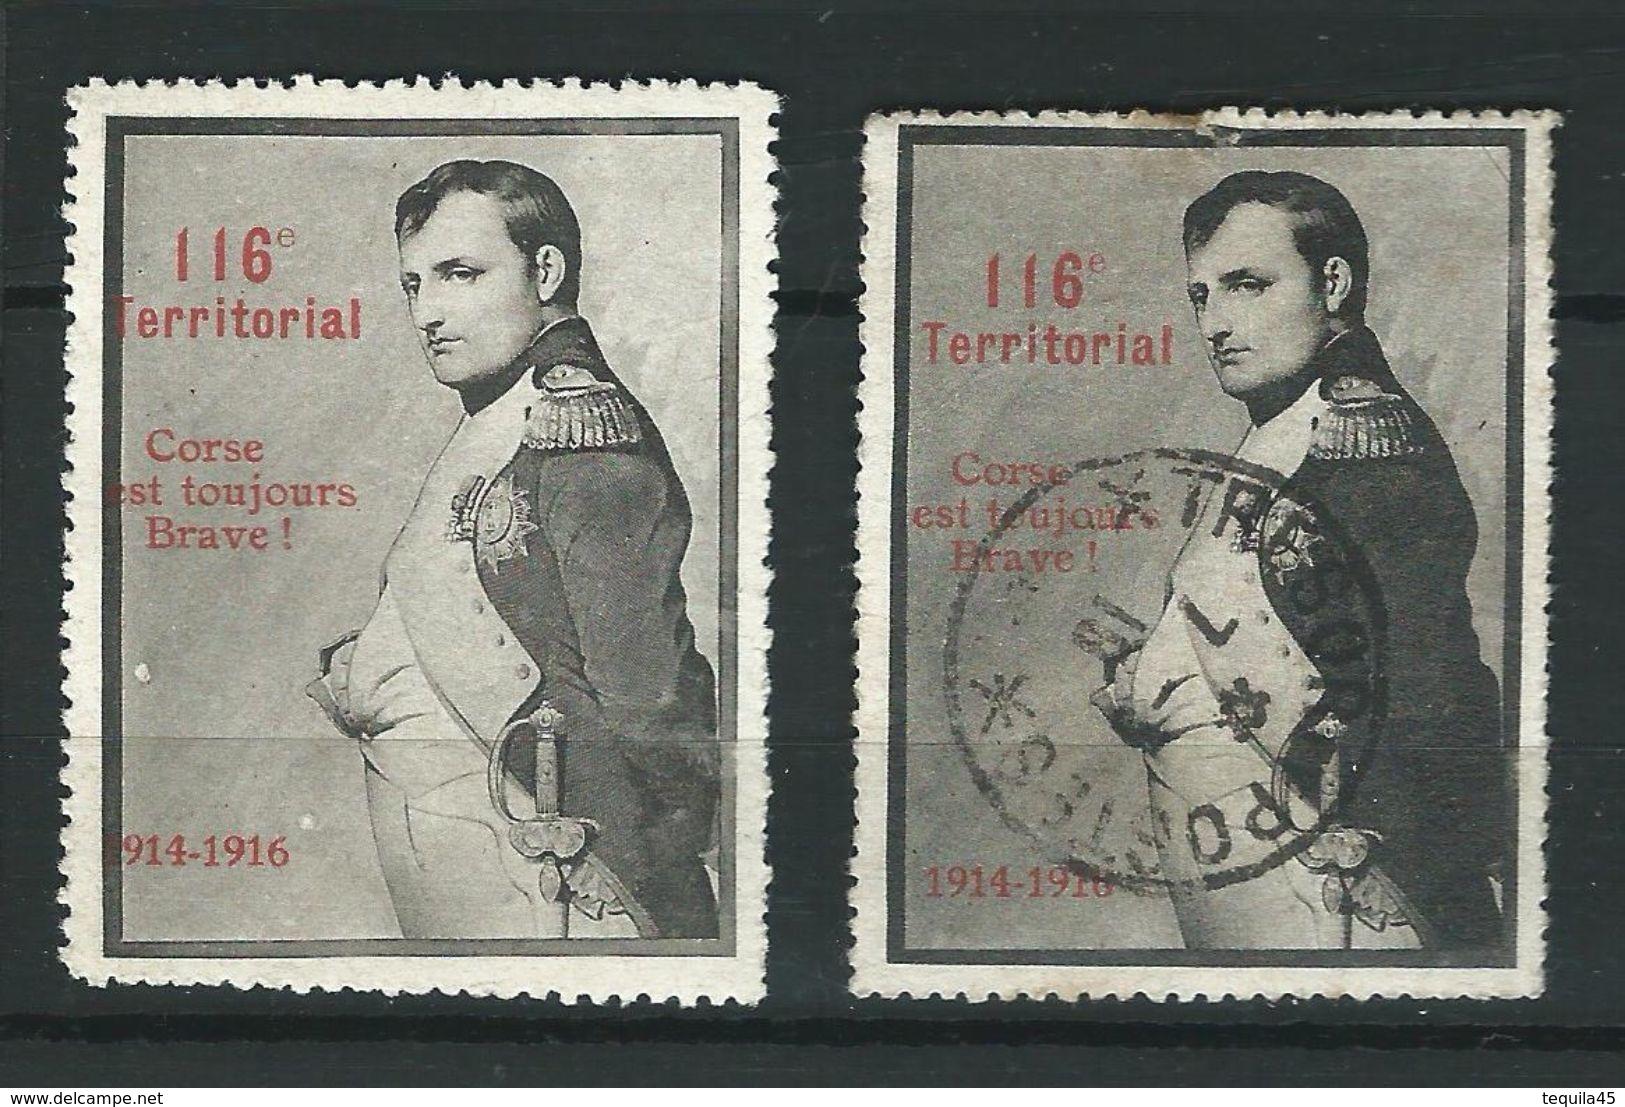 2 Vignettes DELANDRE NAPOLEON 116 ème Territorial WWI WW1 Poster Stamp 1914 1918 Cinderella - Vignettes Militaires